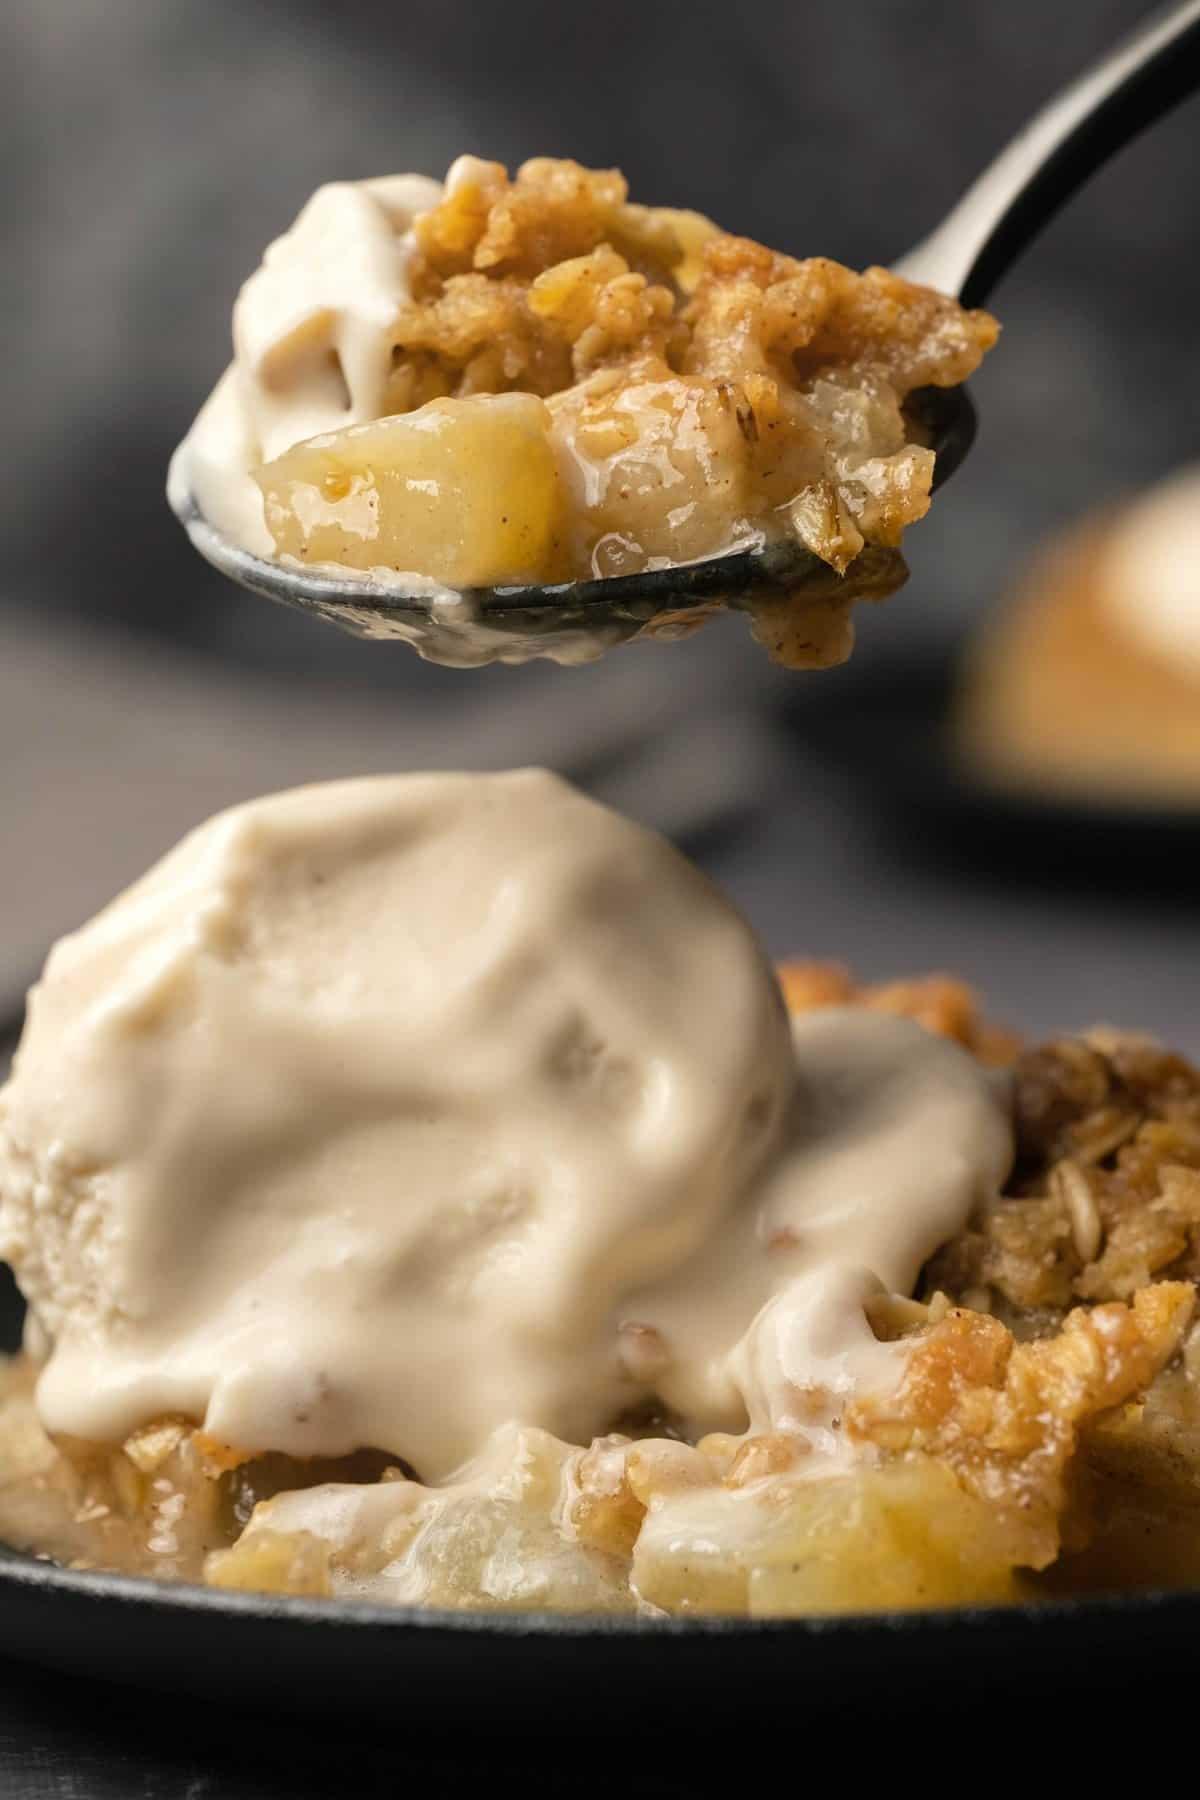 Spoonful of apple crisp with ice cream.